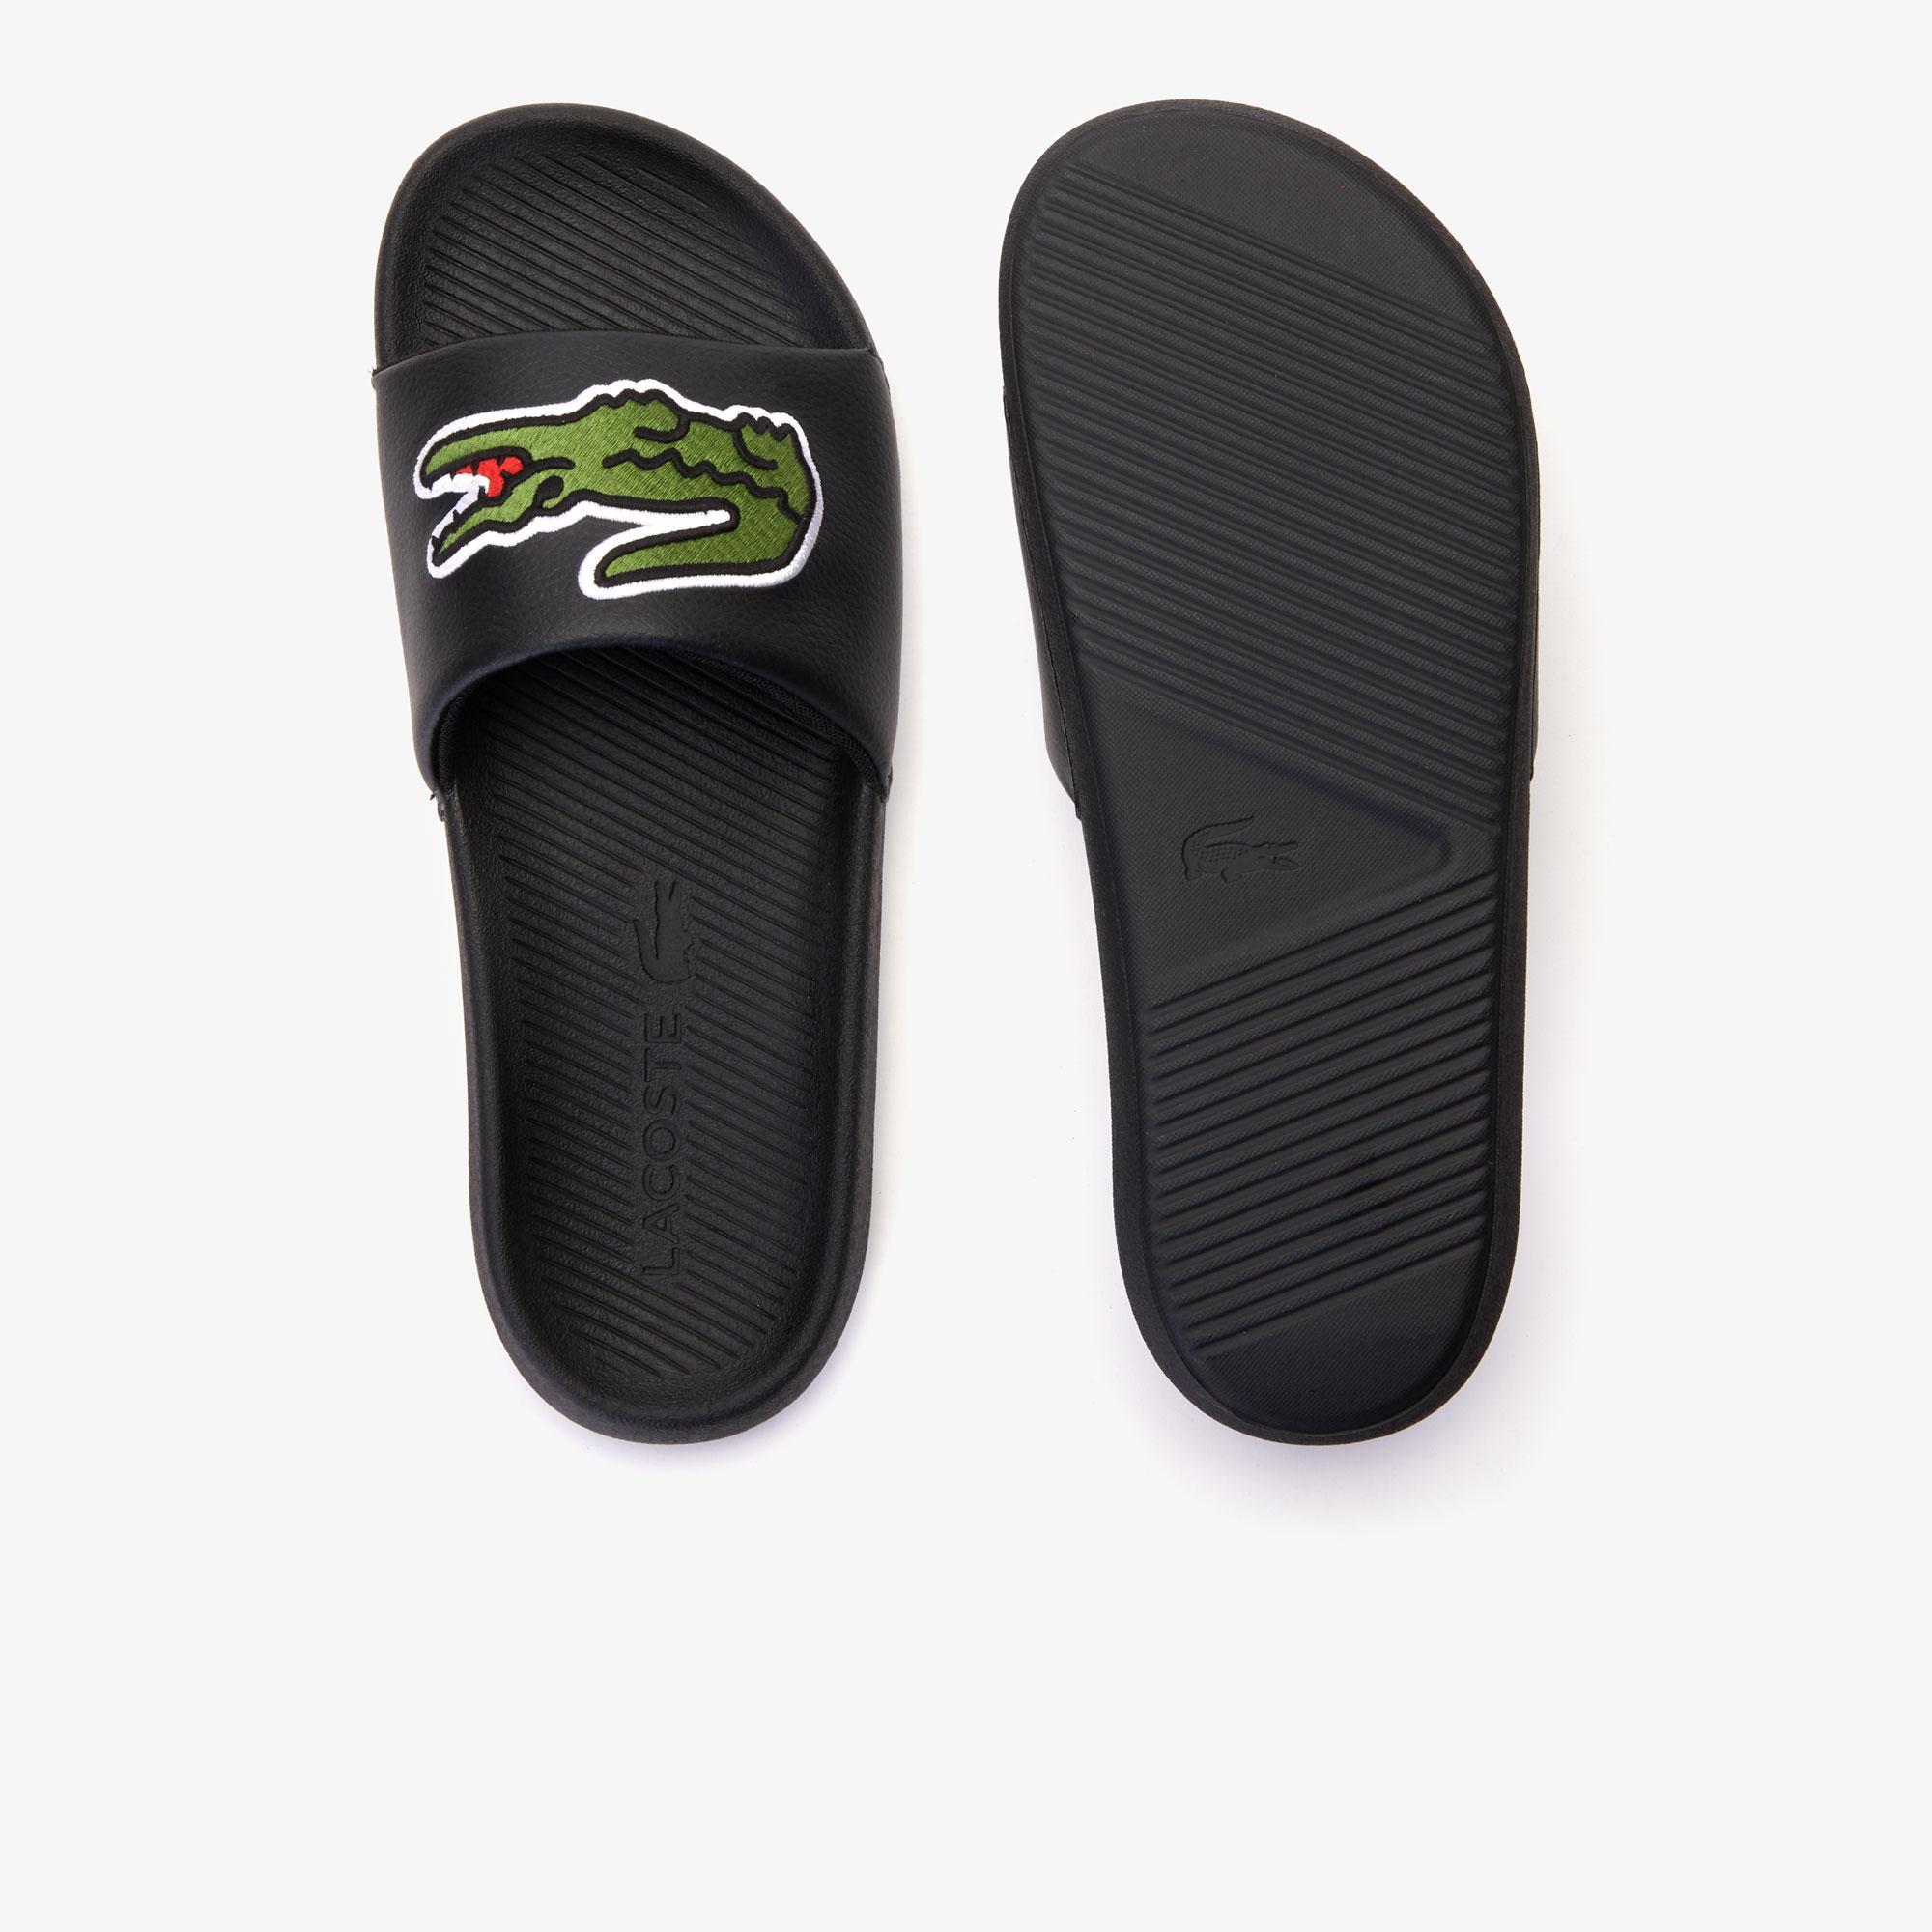 Lacoste Croco Slide 319 4 Us Cma Erkek Siyah - Yeşil Terlik